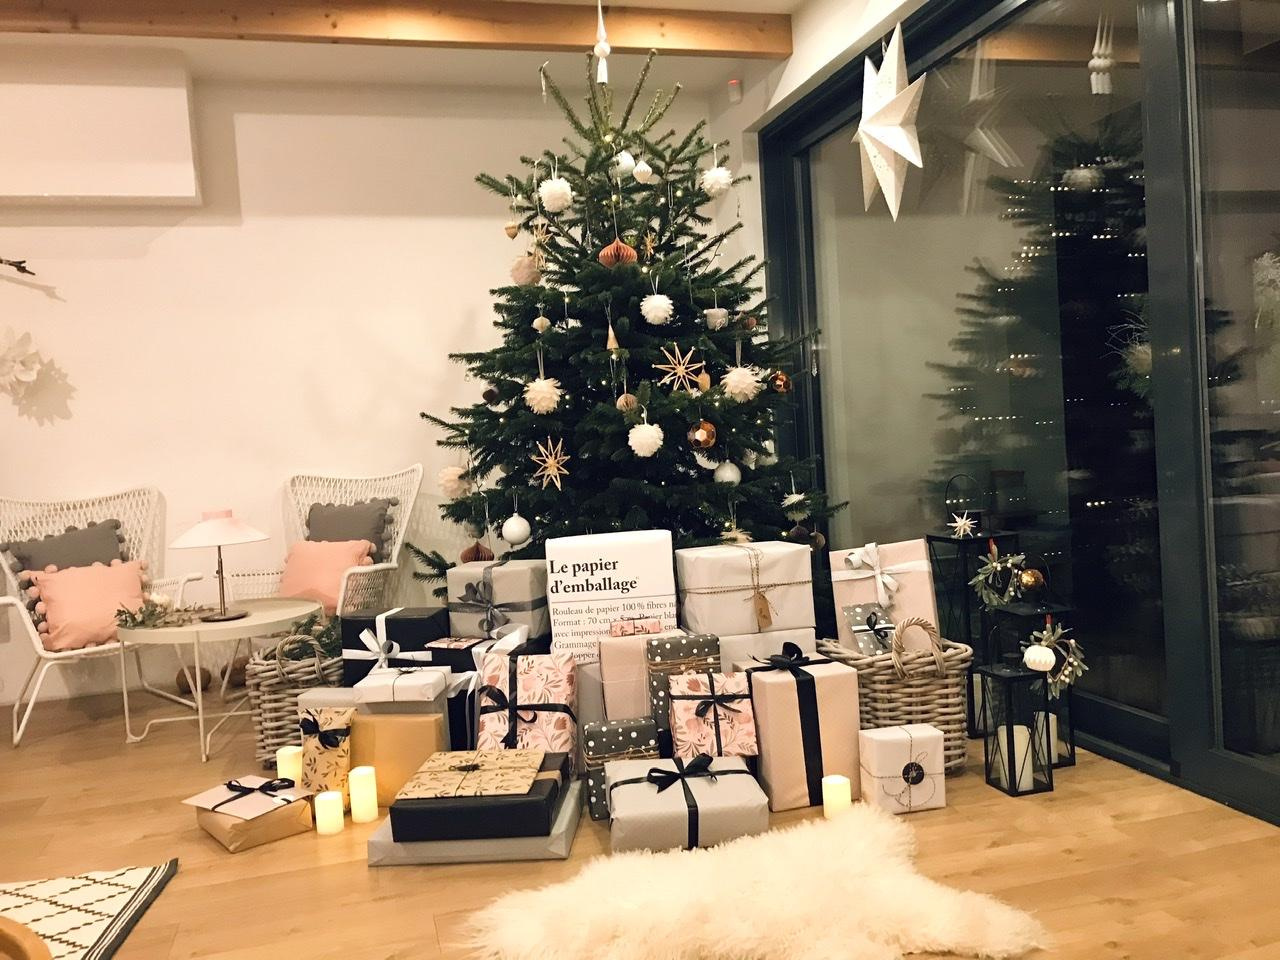 Naše L-ko - 2021 - stále dokončujeme - štedrý večer - stromček s darčekami